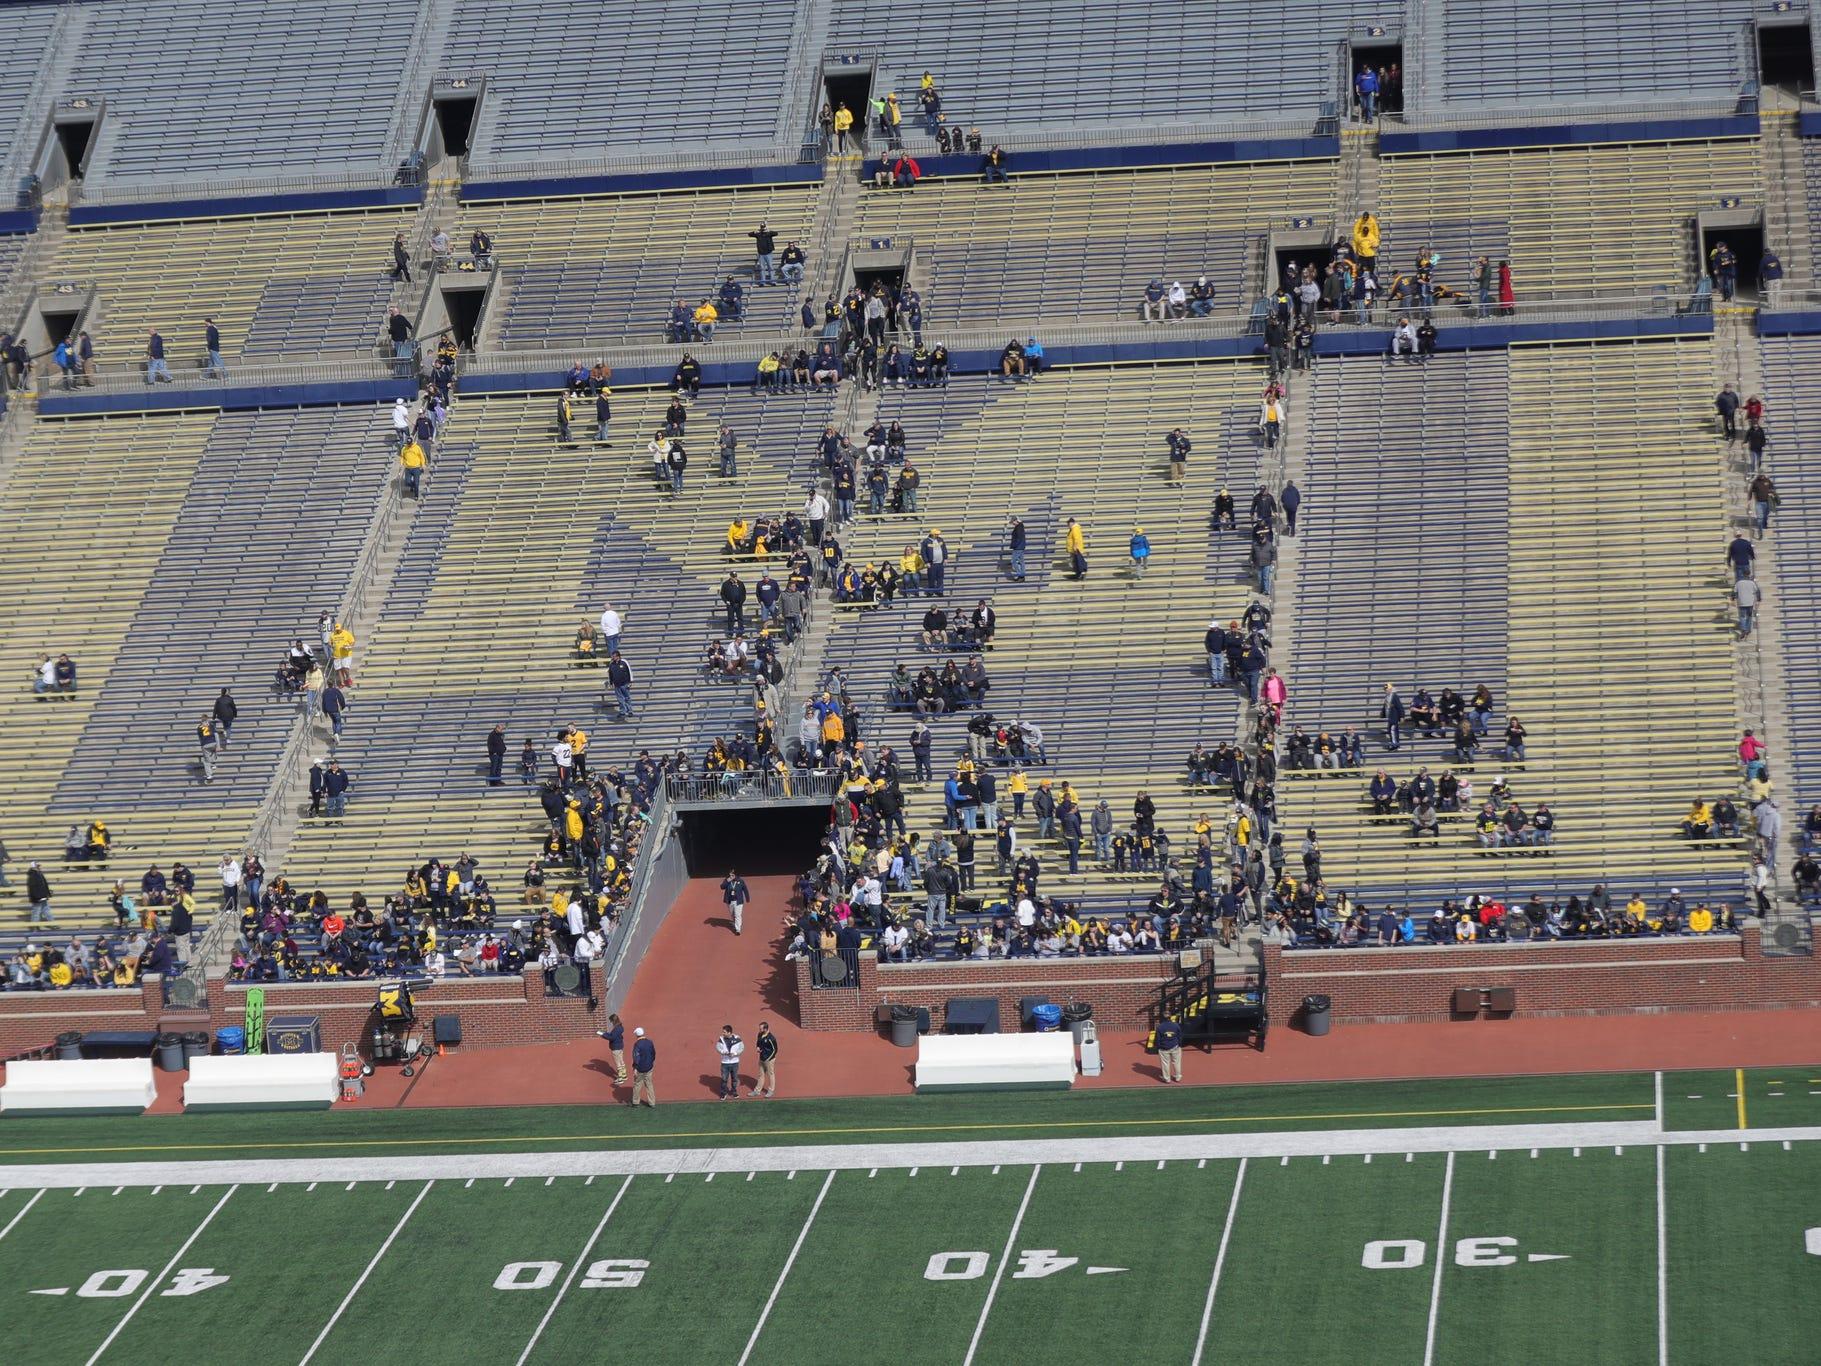 Michigan fans arrive for the spring game Saturday, April 13, 2019 at Michigan Stadium in Ann Arbor.